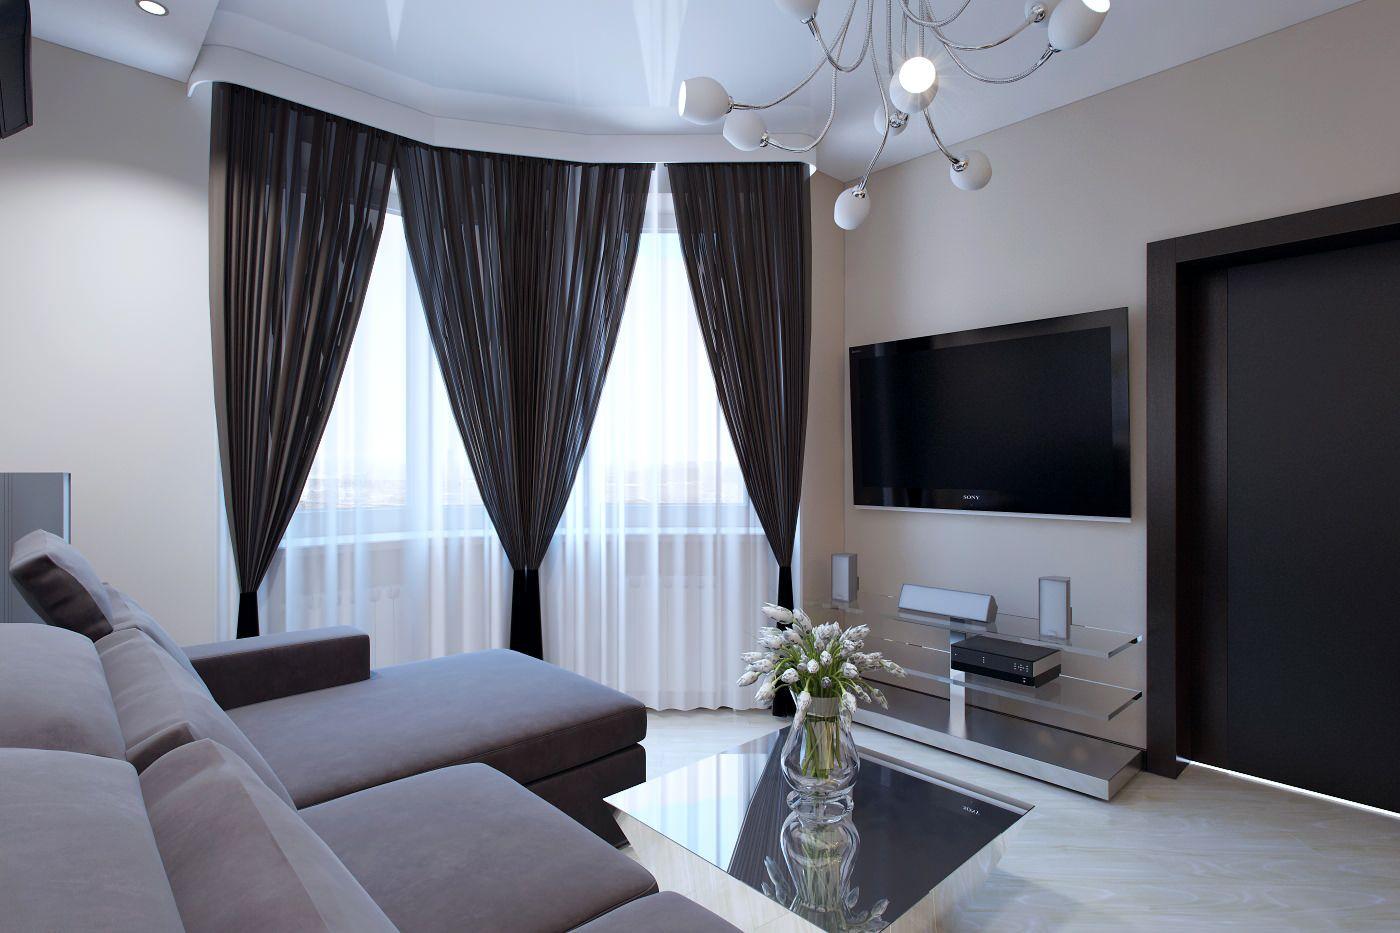 dizajn-proekt-panelnoj-trekhkomnatnoj-kvartiry-70-kv-m31